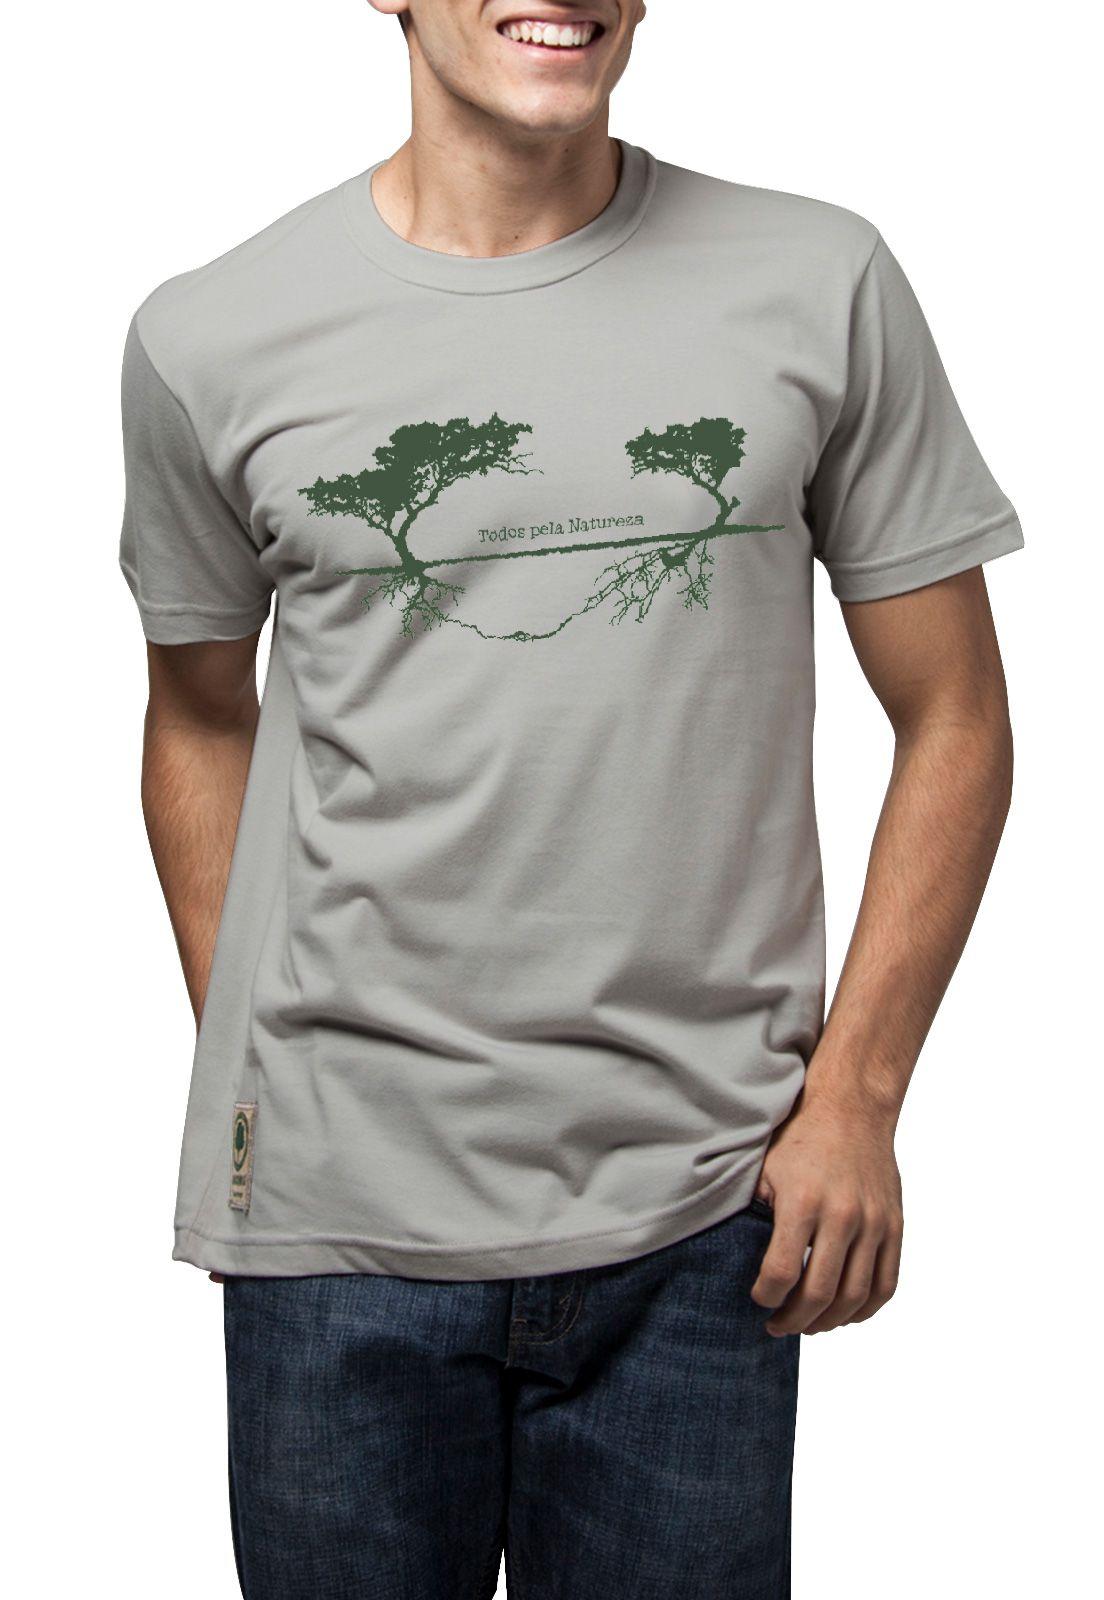 Camiseta Amazônia Todos Pela Natureza - Bege Claro